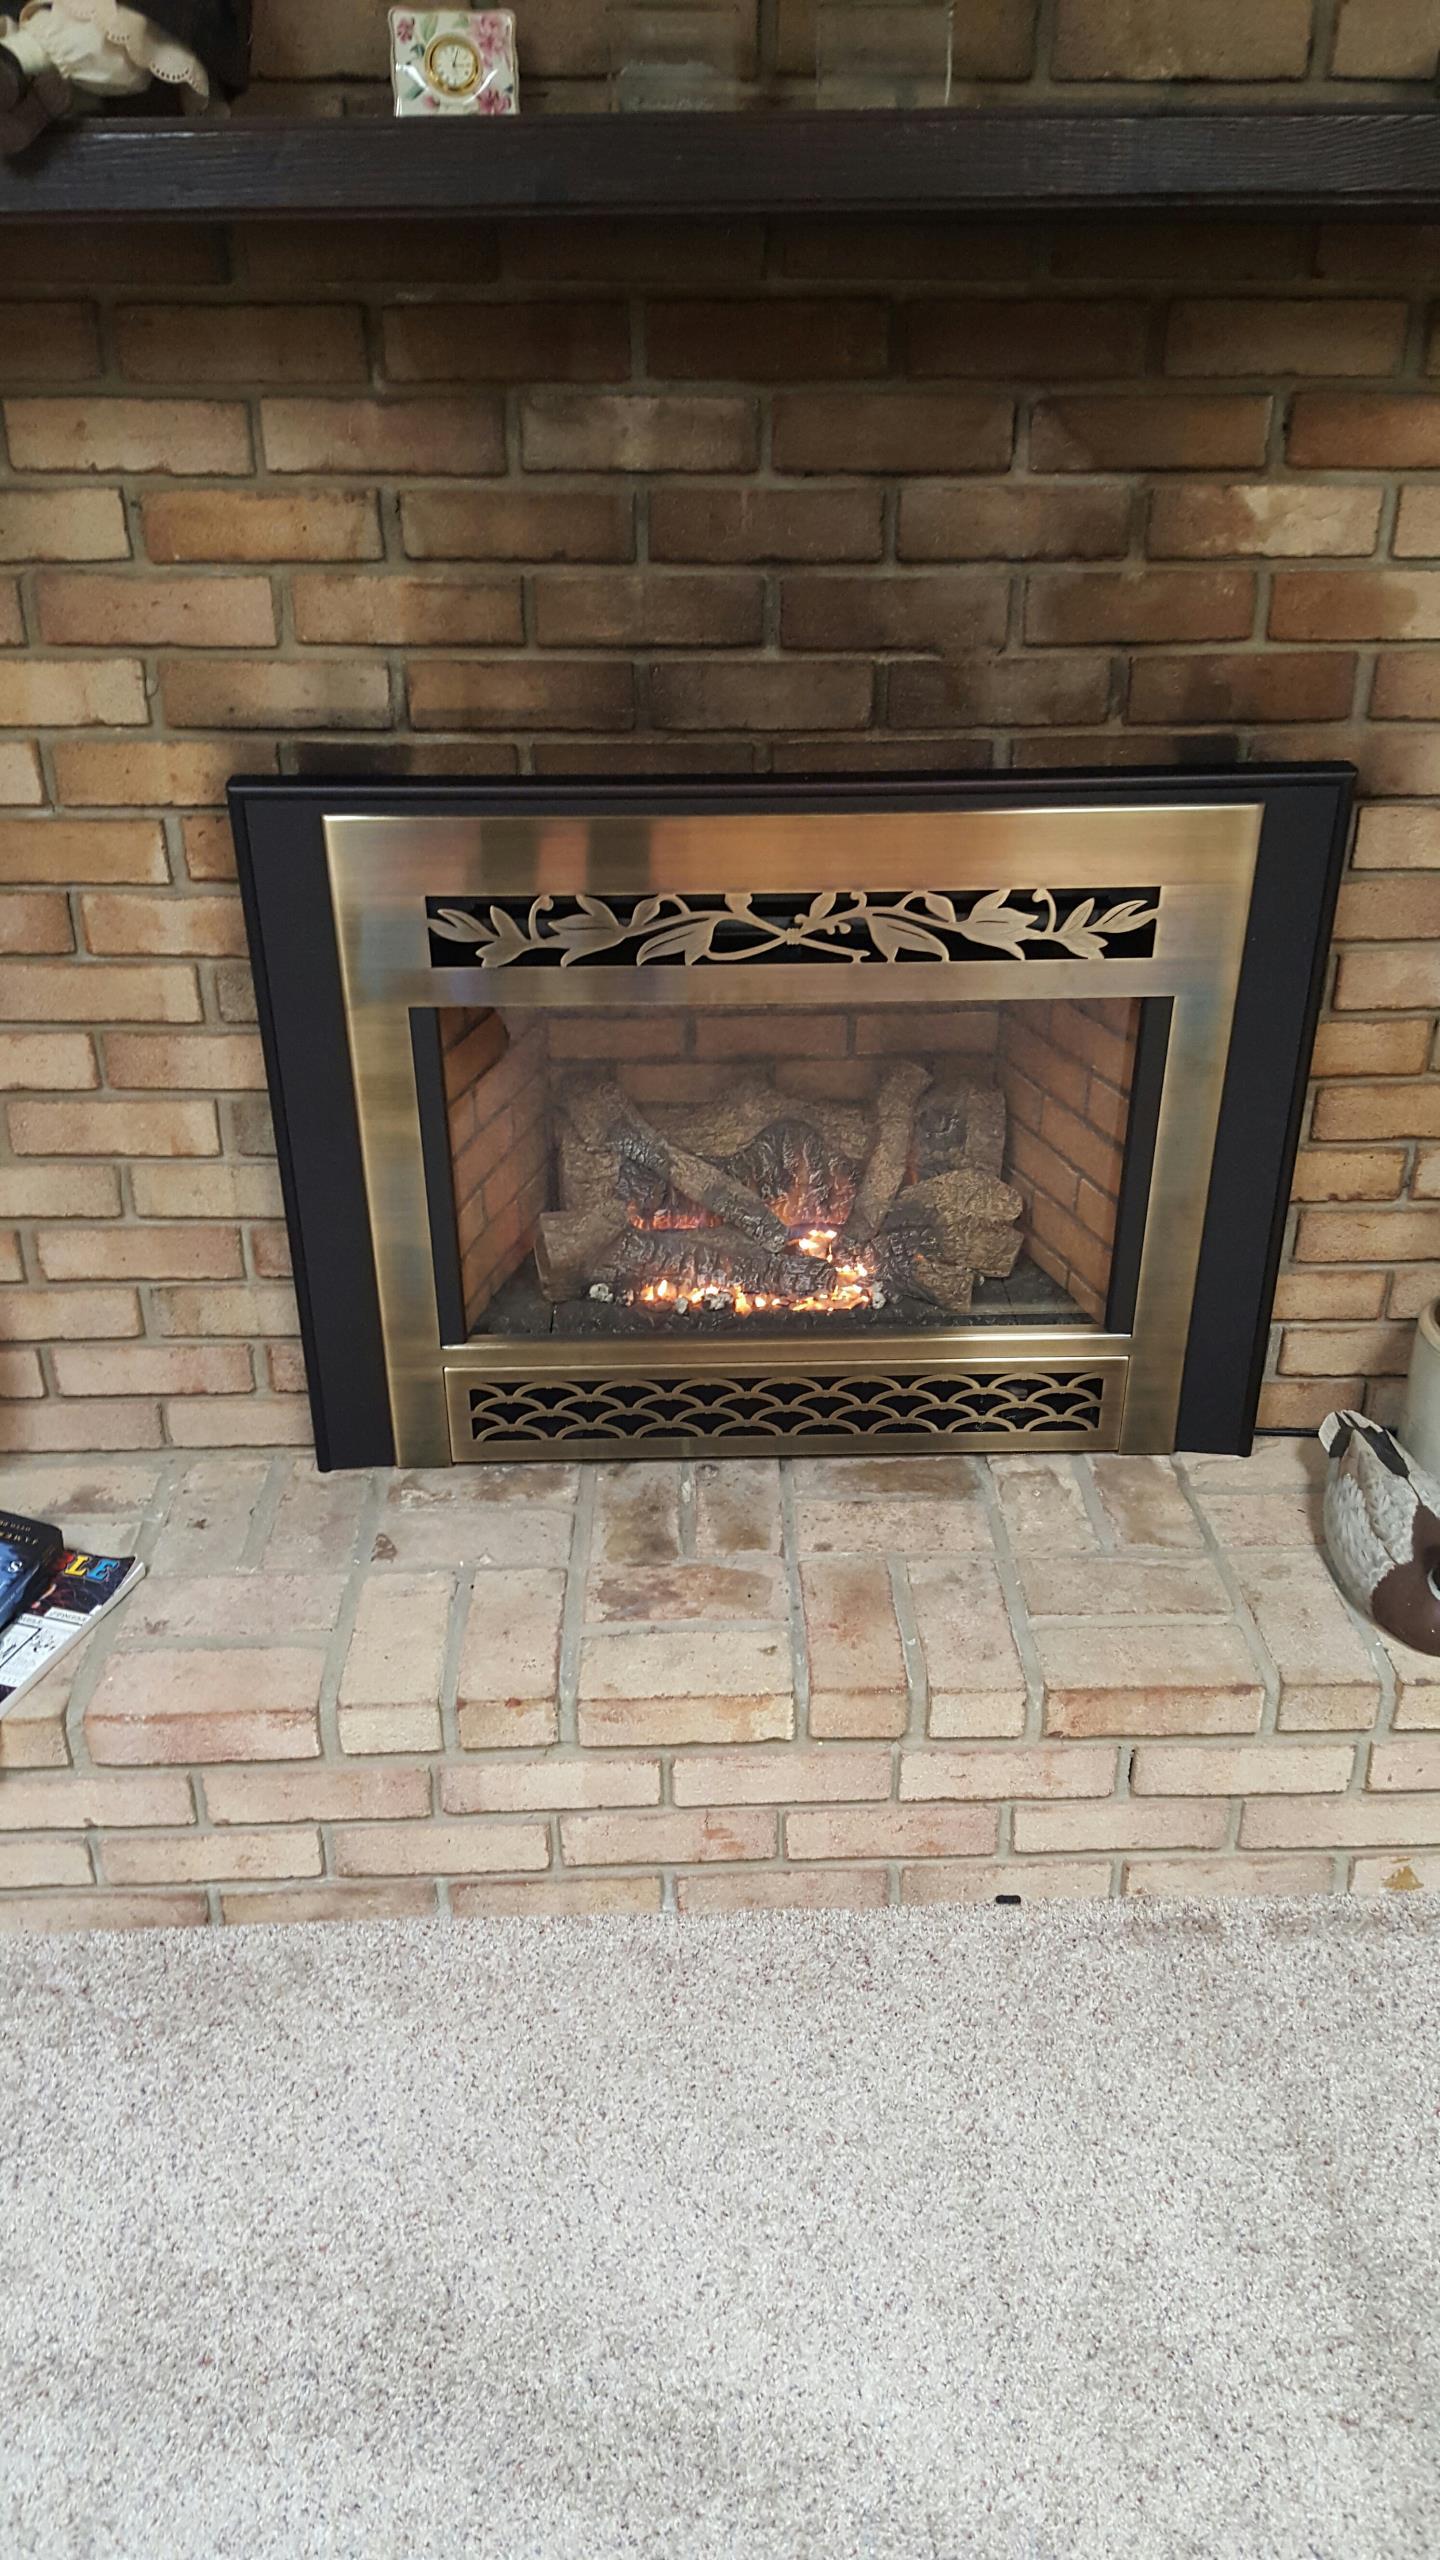 Crofton, MD - Gas fireplace insert & gas logs repair service call Crofton Maryland